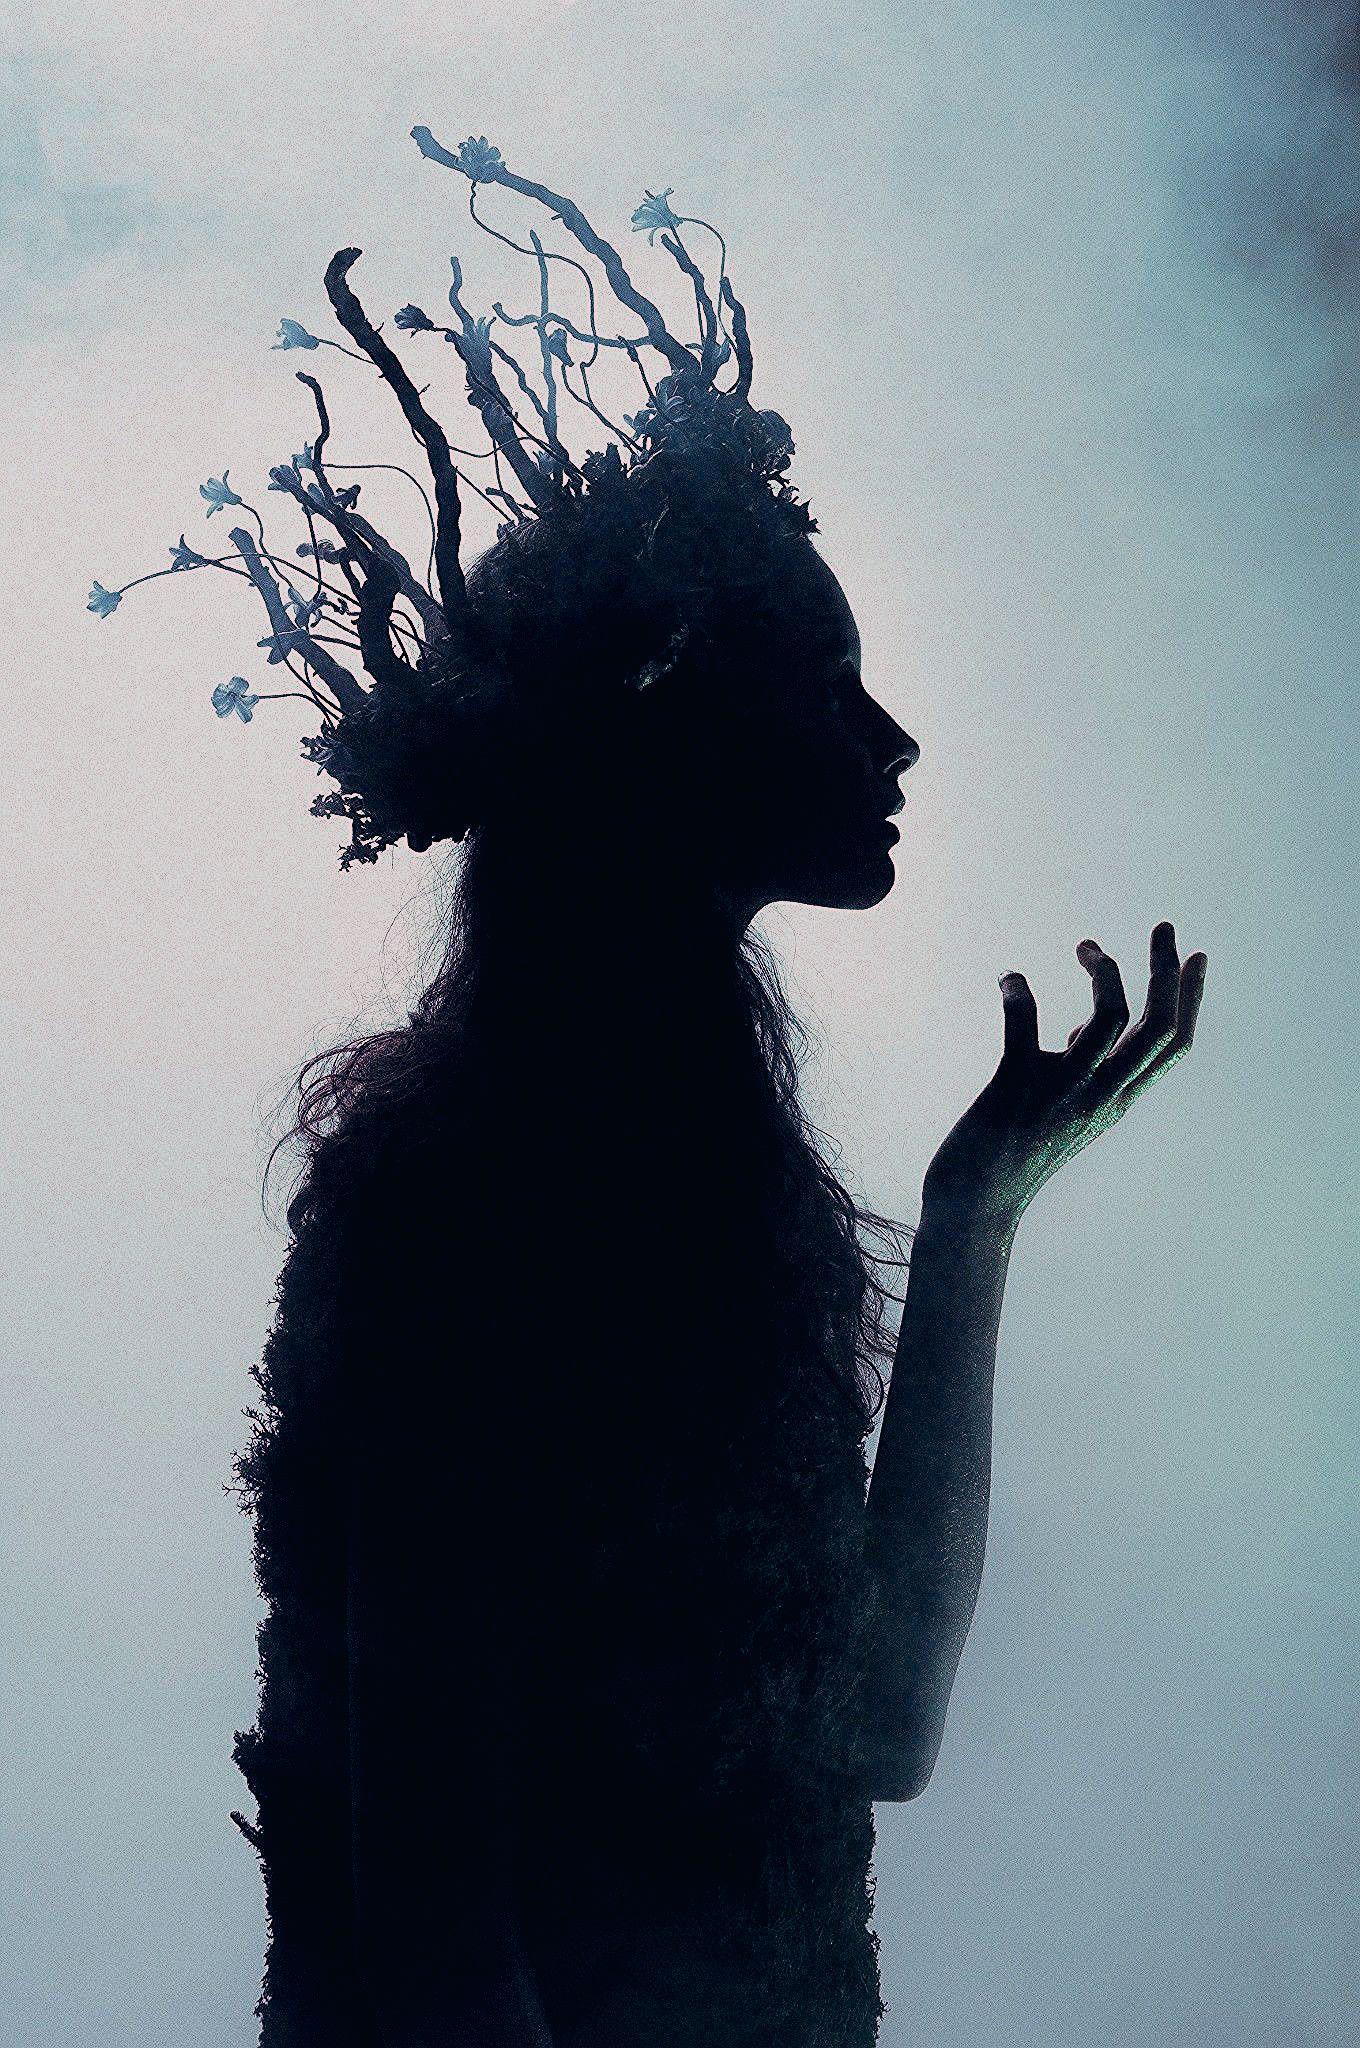 Unique Fantasy Aesthetic Photography - Creative Maxx Ideas